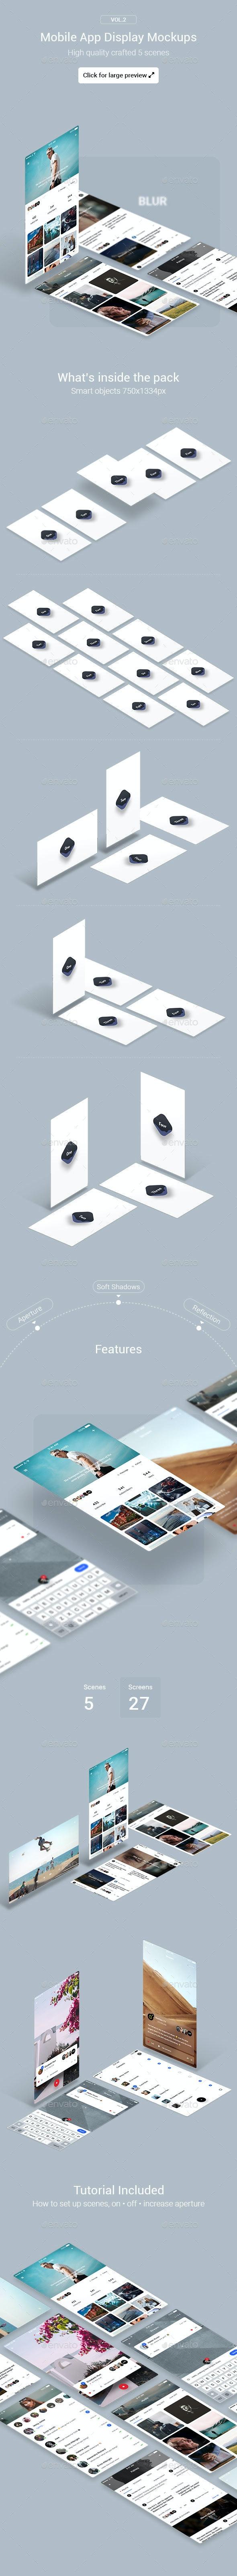 Mobile App Display Mockups Vol.2 - Mobile Displays